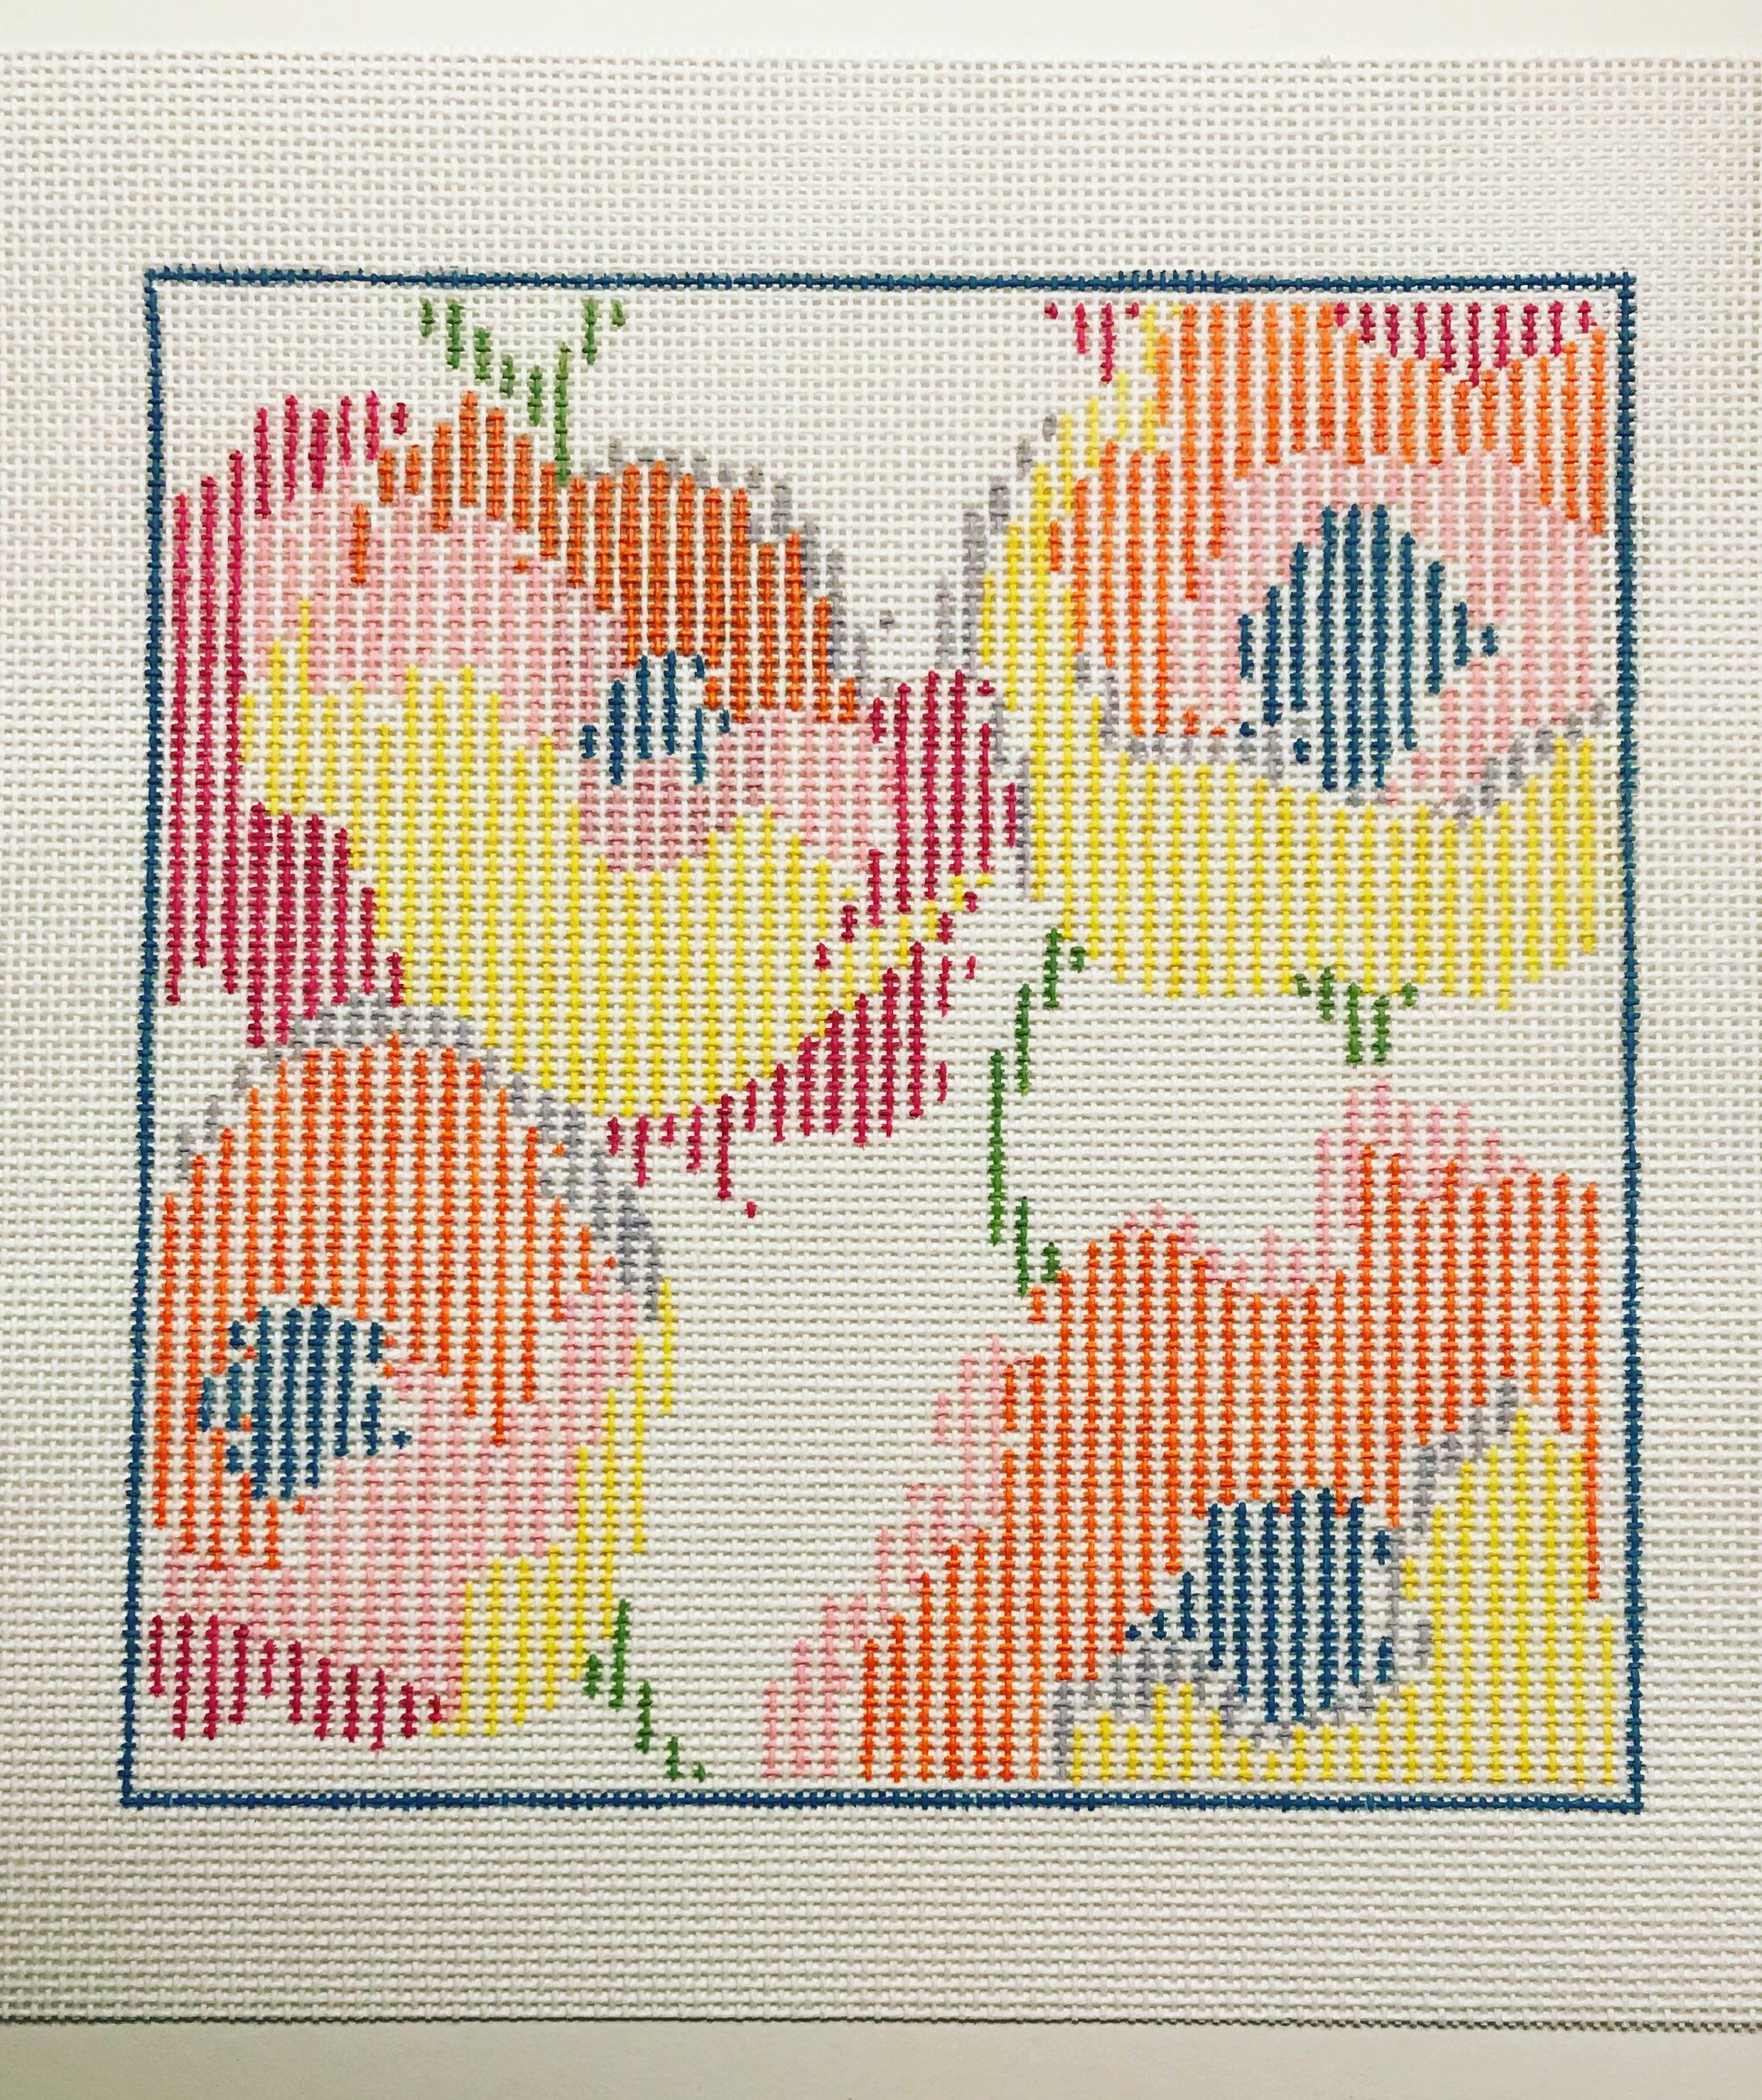 "Citrus-striped Flowers 15LL   6"" x 6.5"" on `18 mesh"